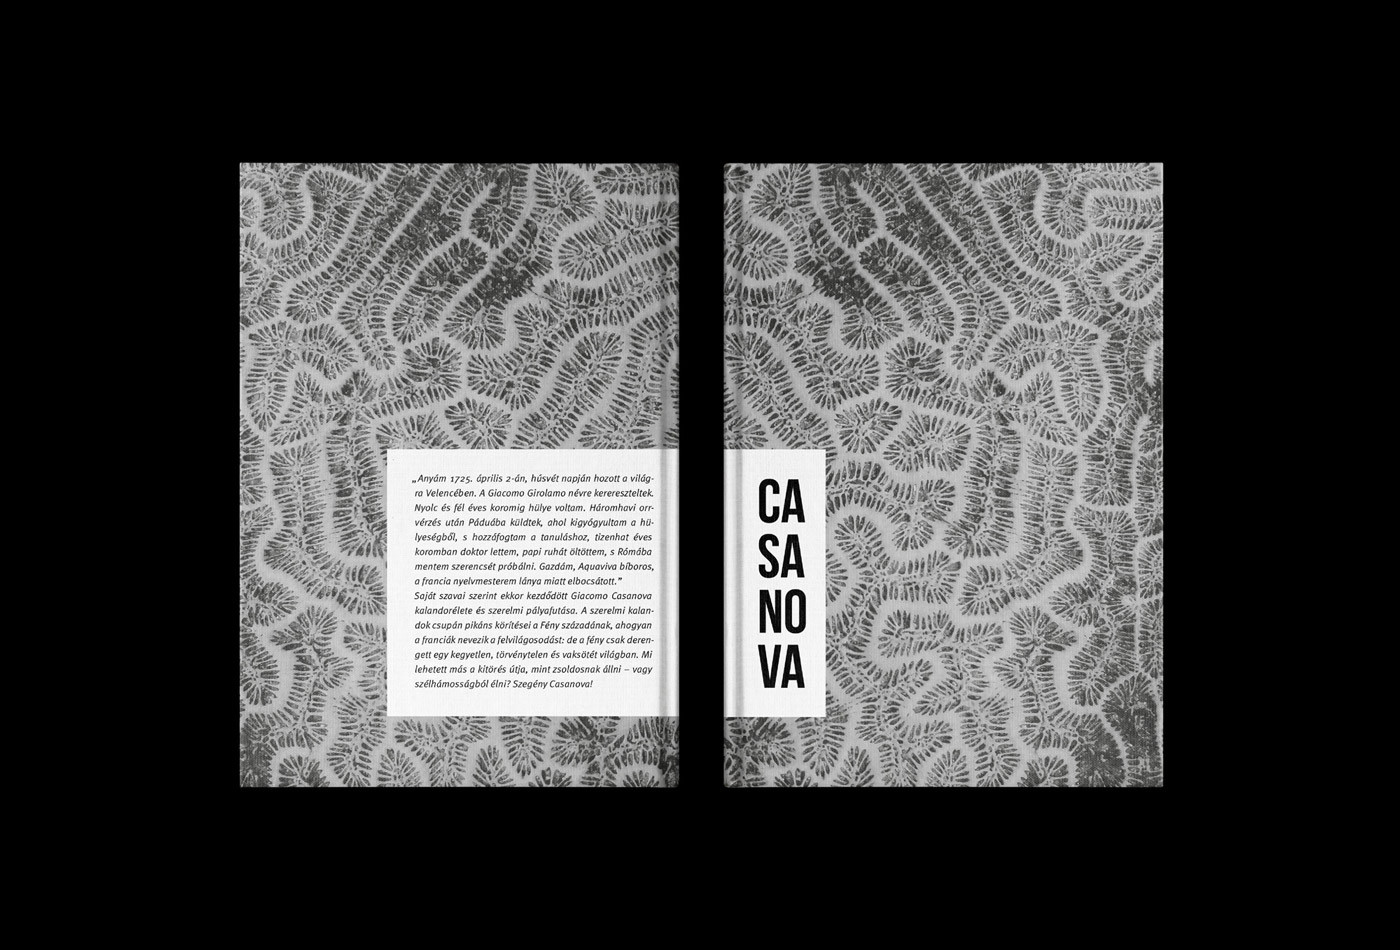 Book-Covers-04.jpg